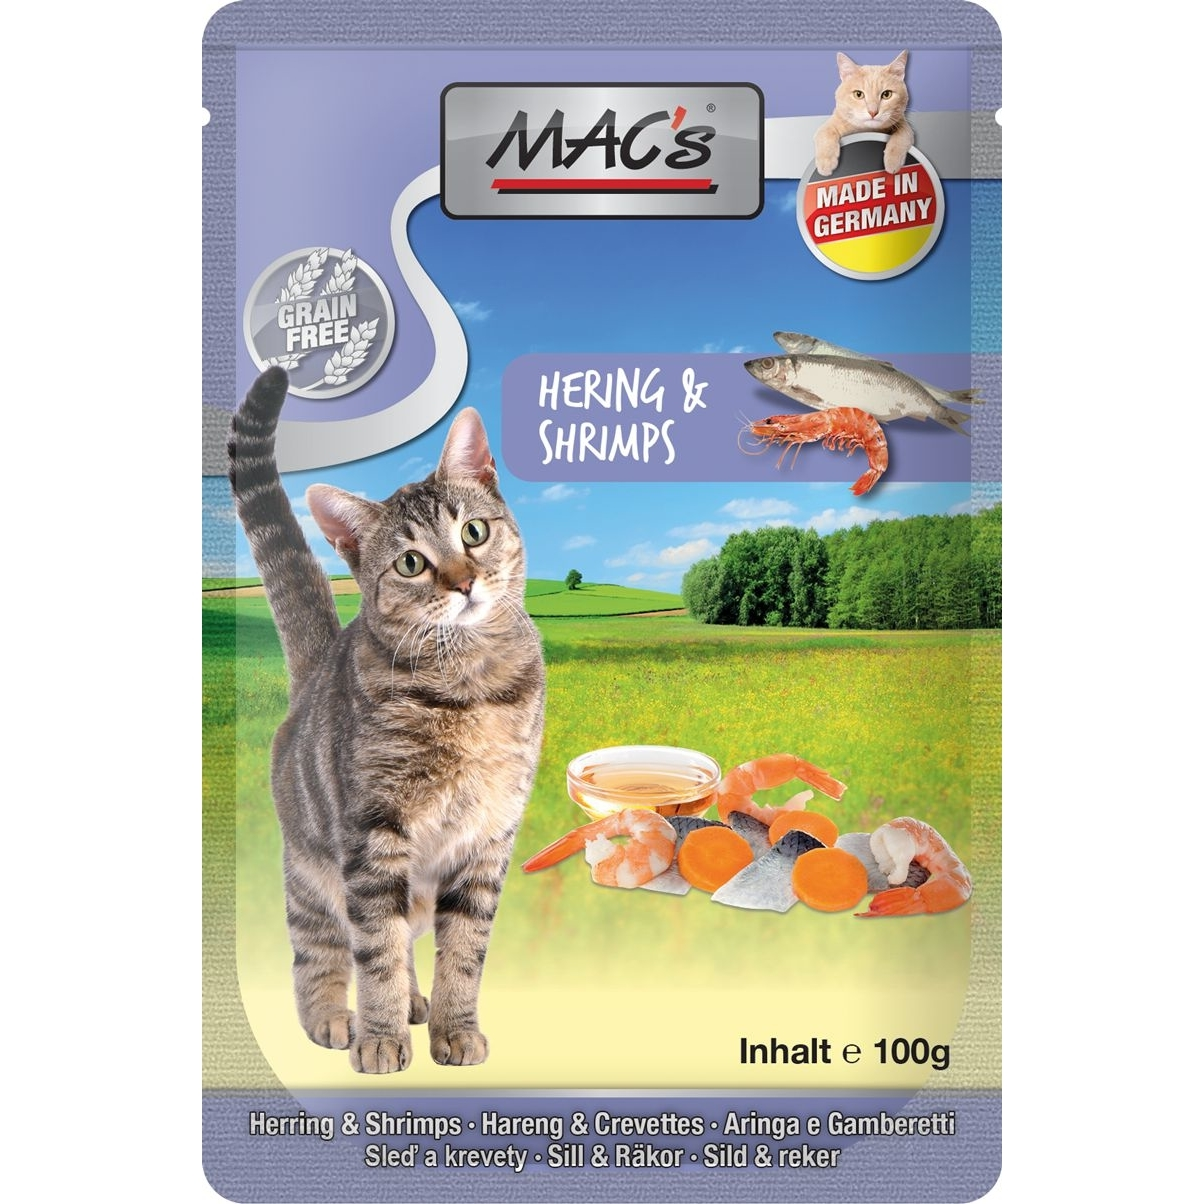 MACs Cat Pouch Pack Frischebeutel, Bild 3